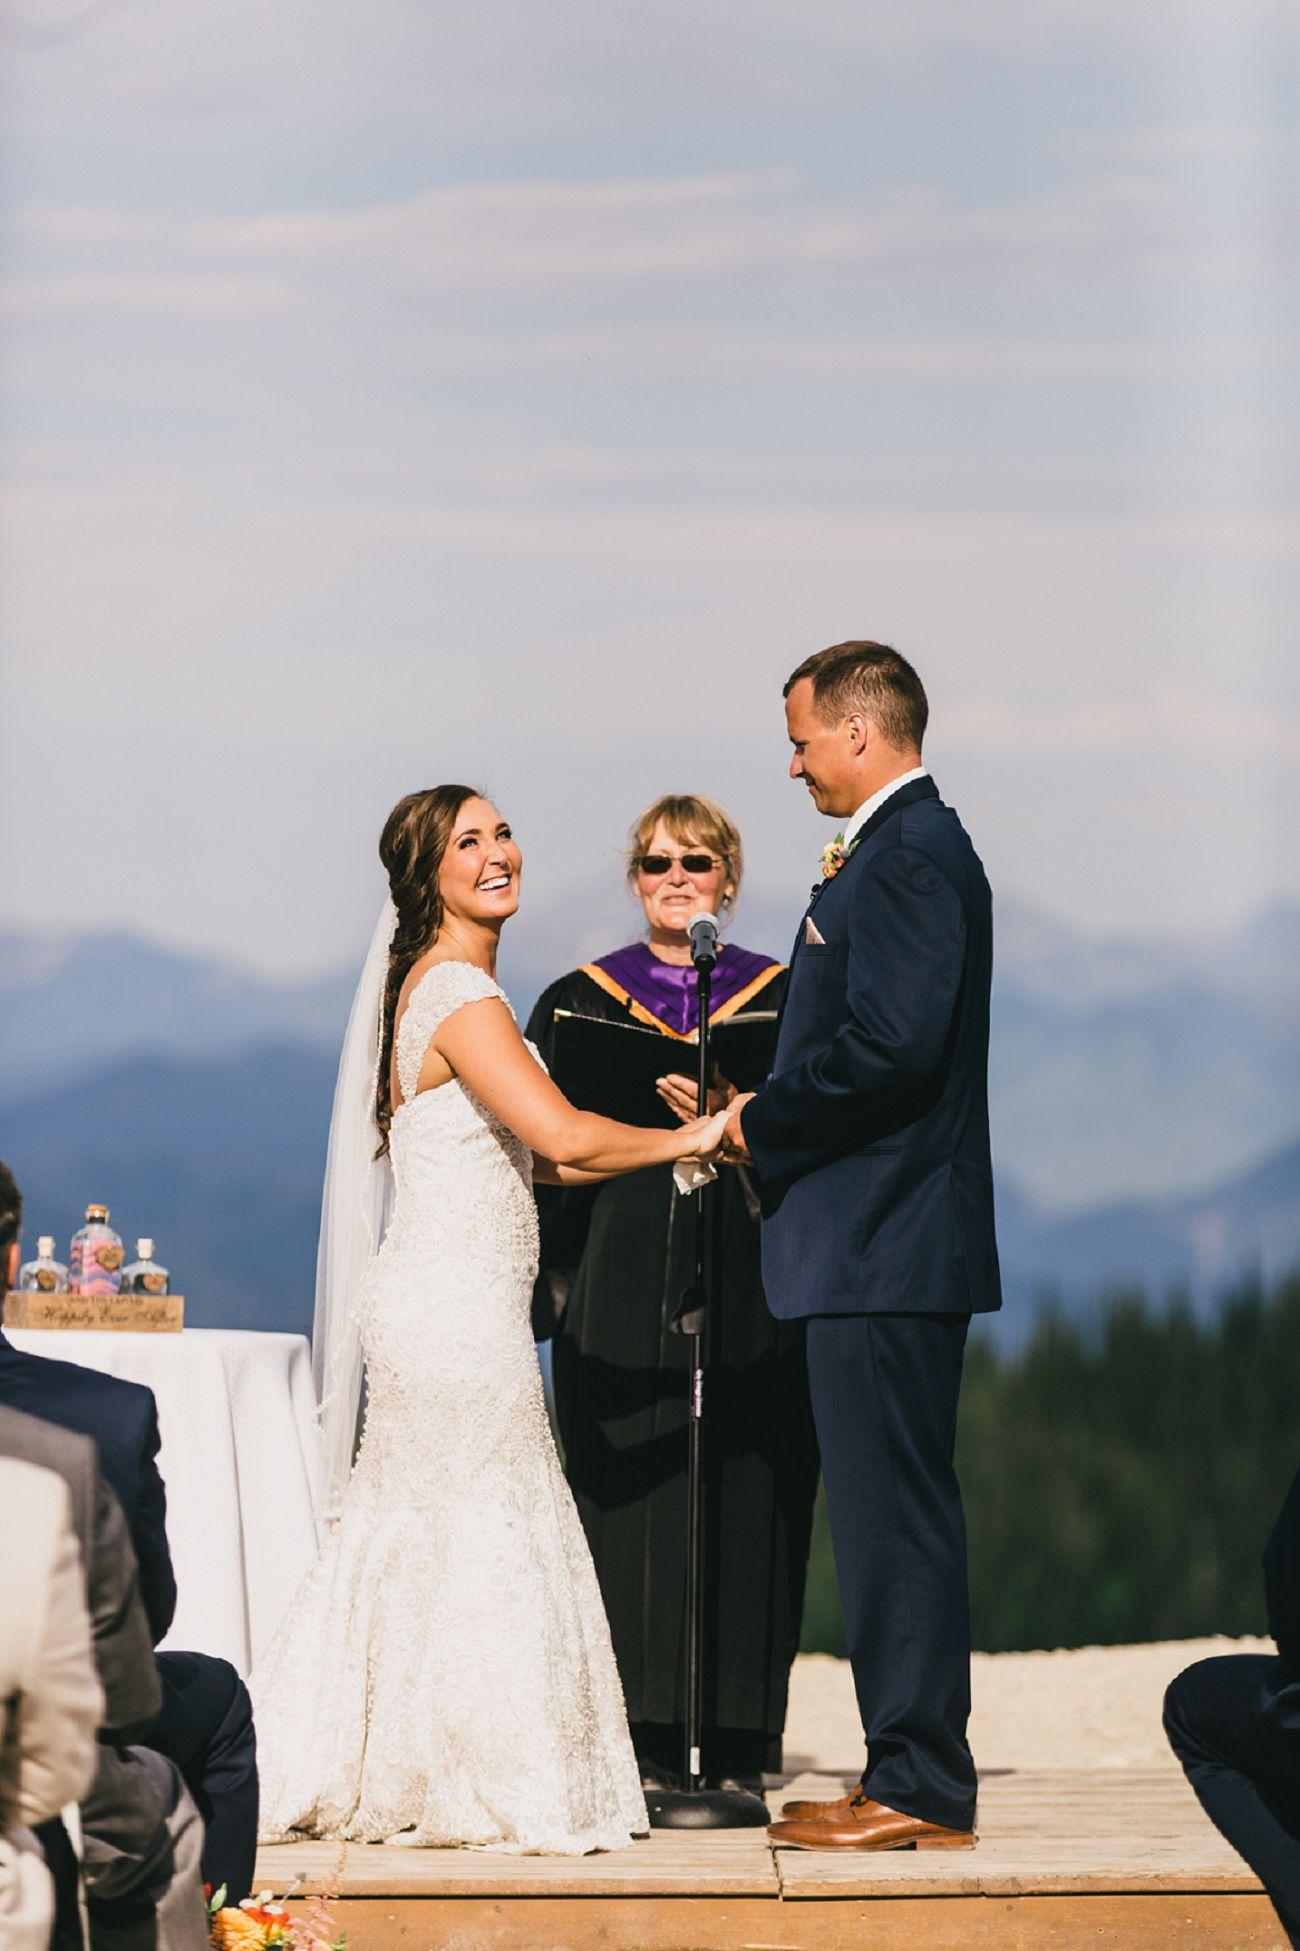 Jennifer_Mooney_Photo_Whitefish_Mountain_Resort_Wedding_00073.jpg